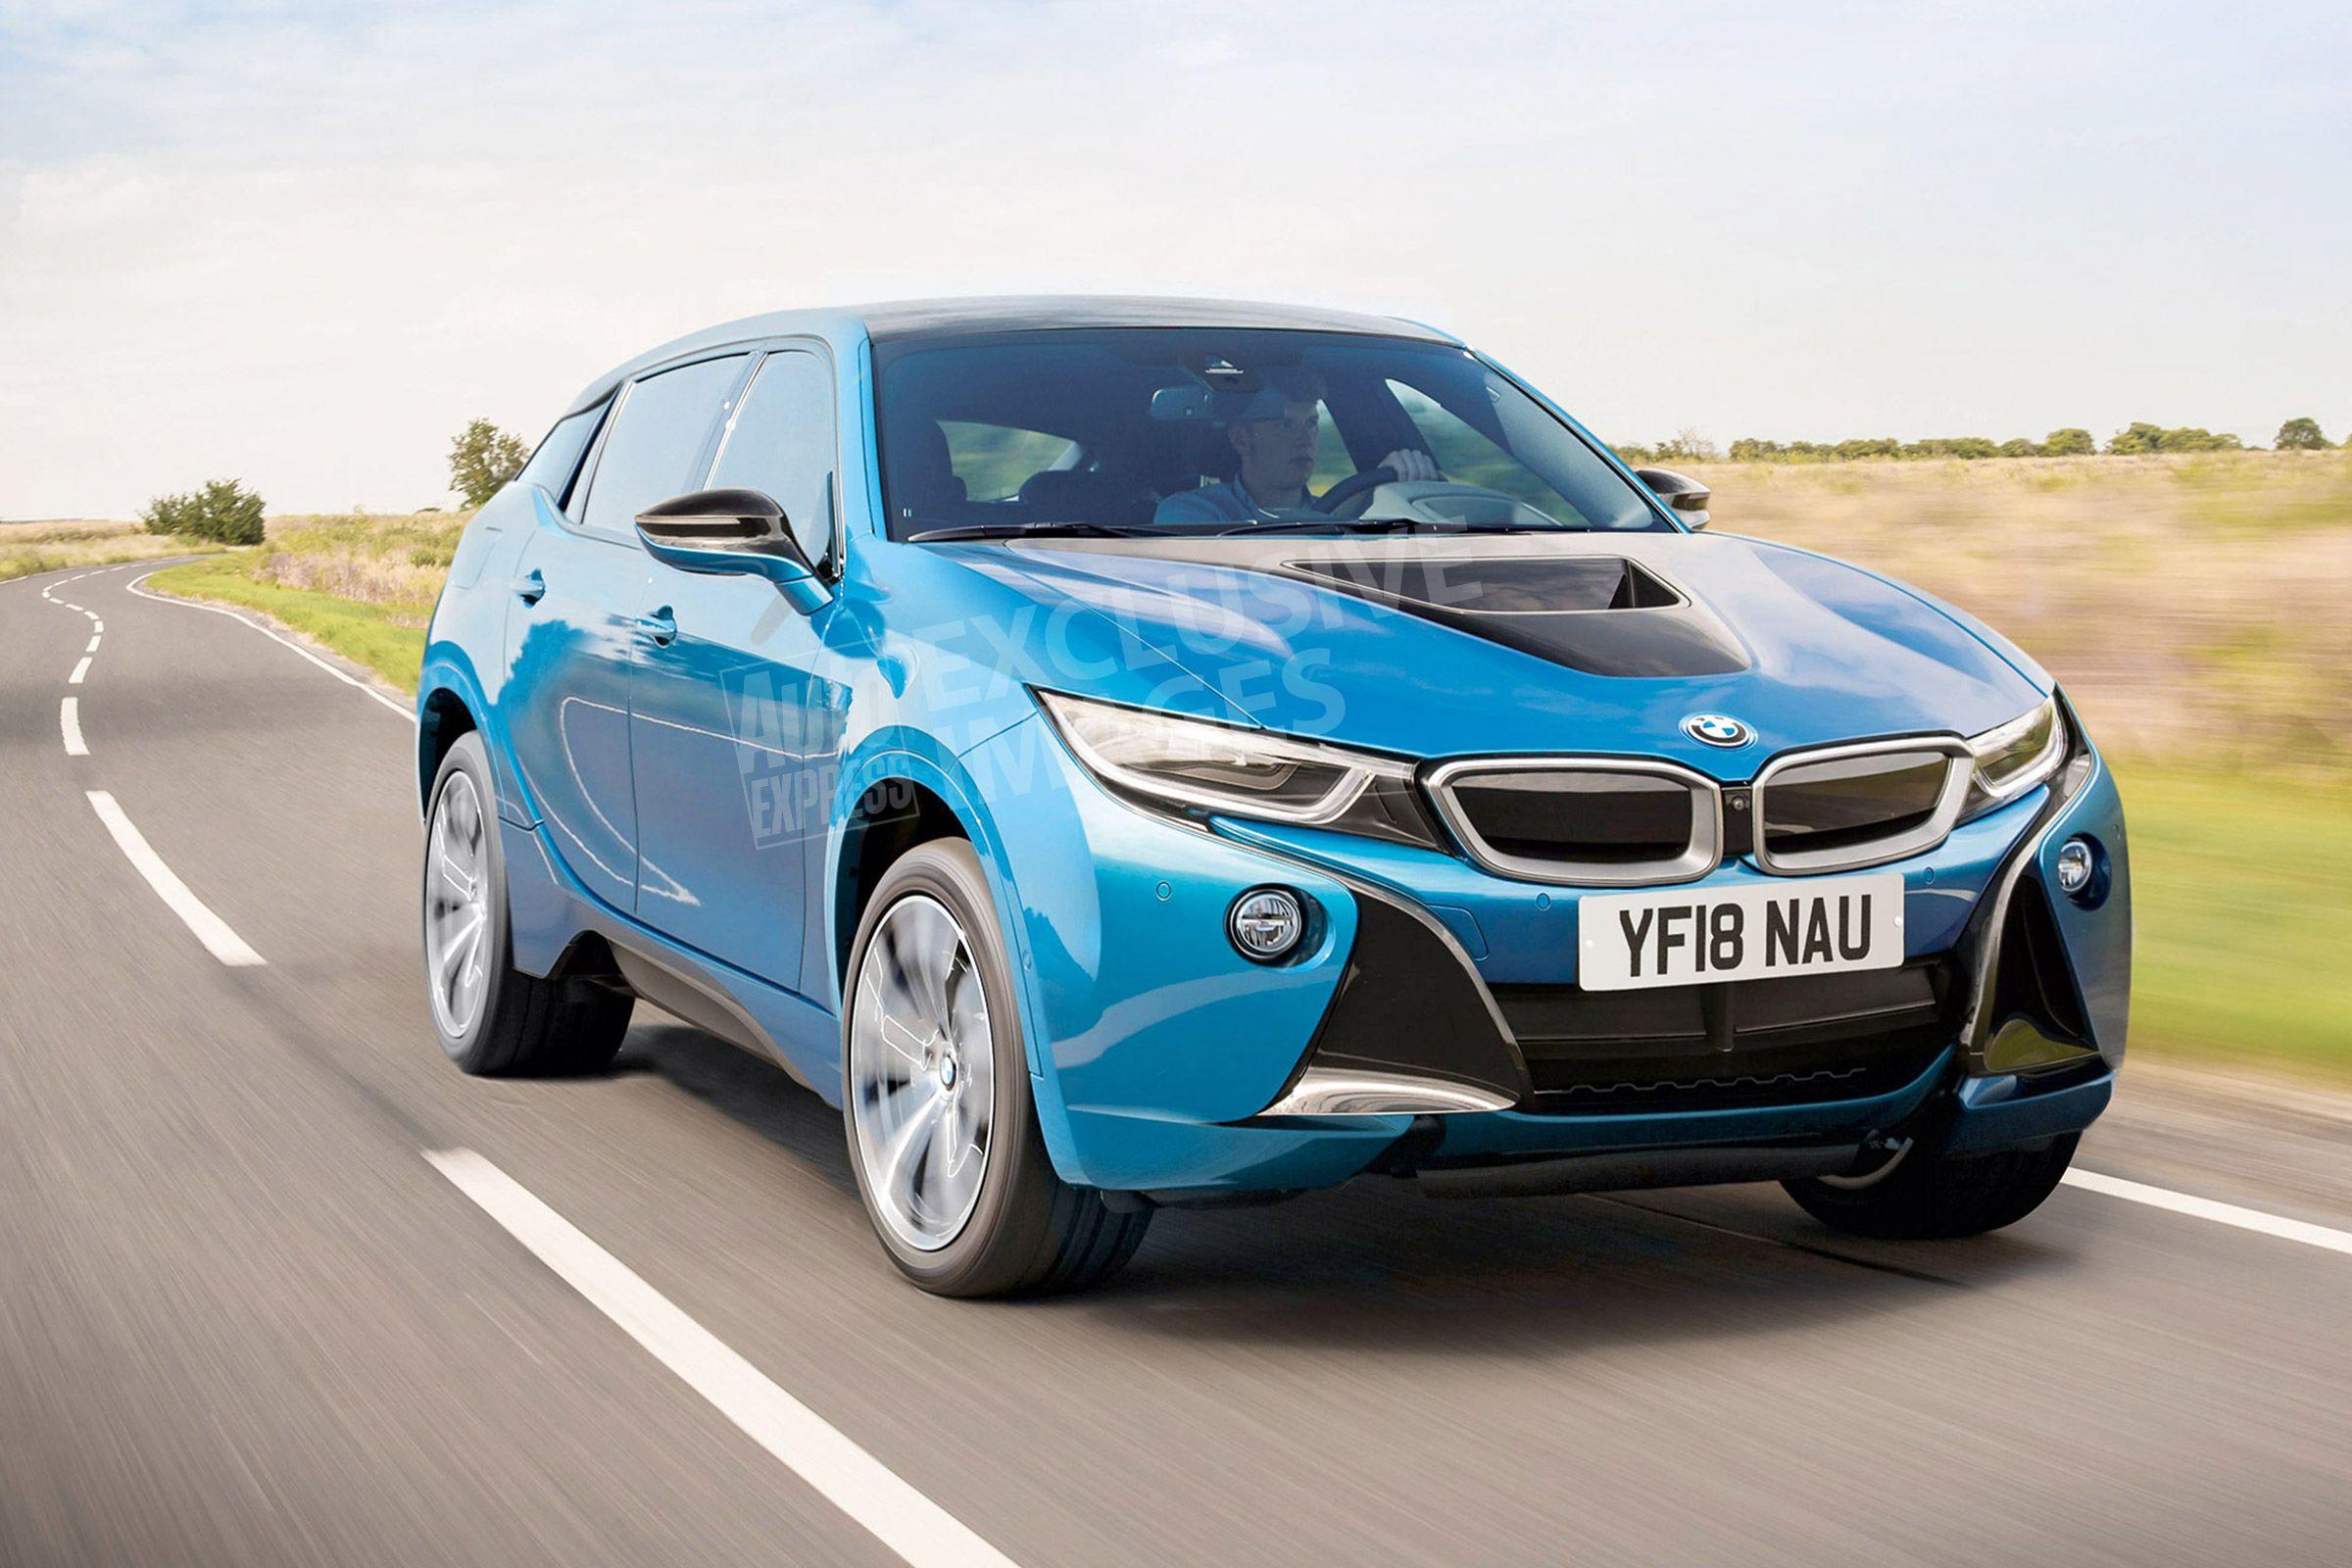 New 2021 BMW i4 532bhp and 373 mile range for BMW's Tesla